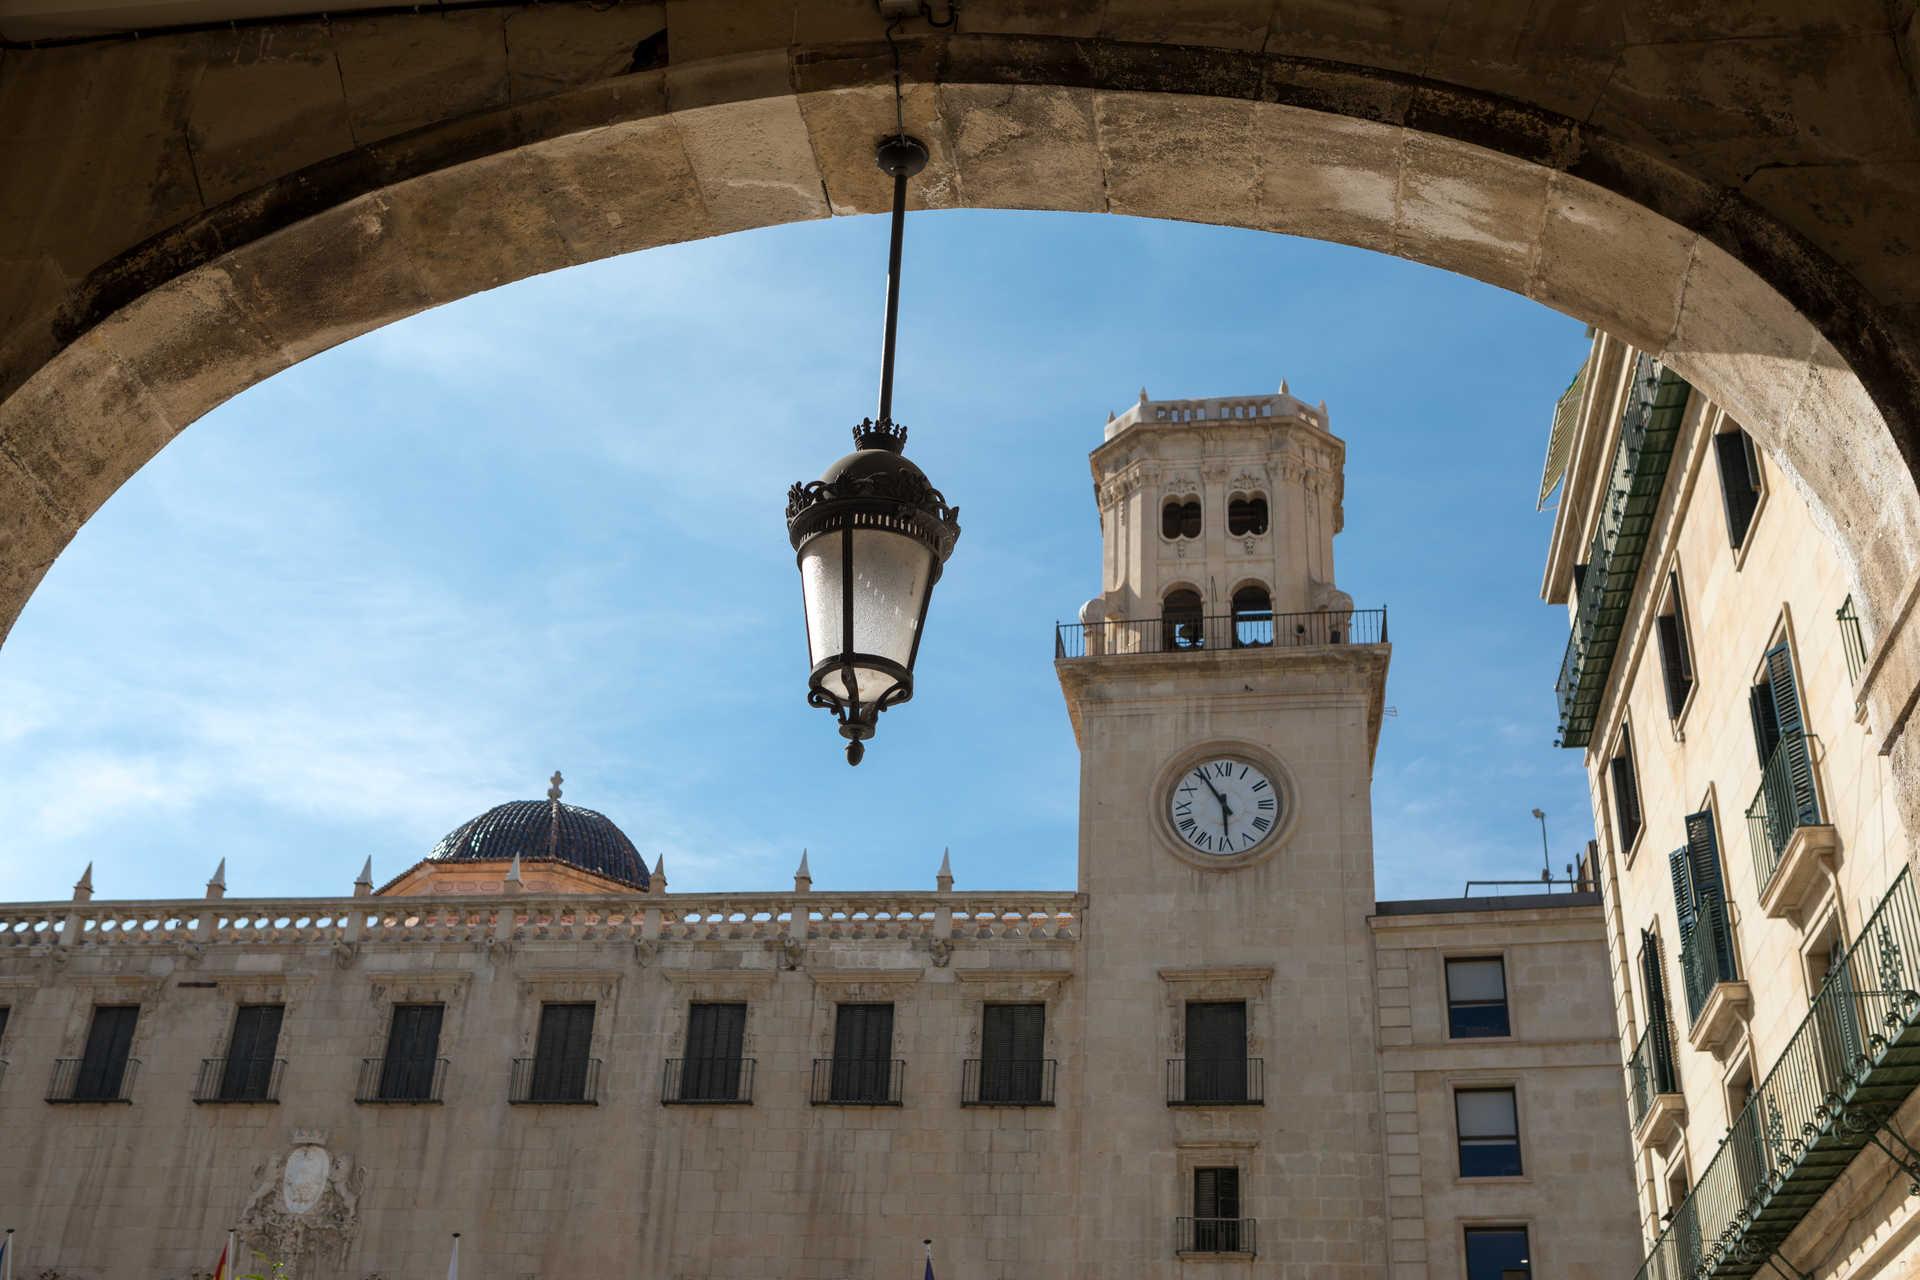 https://multimedia.comunitatvalenciana.com/1A3821679A04436A94CDD6066B327AEA/img/A3973DDC285C4185B4553563B440FA53/Ayuntamiento_Alicante_B4A6150.jpg?responsive